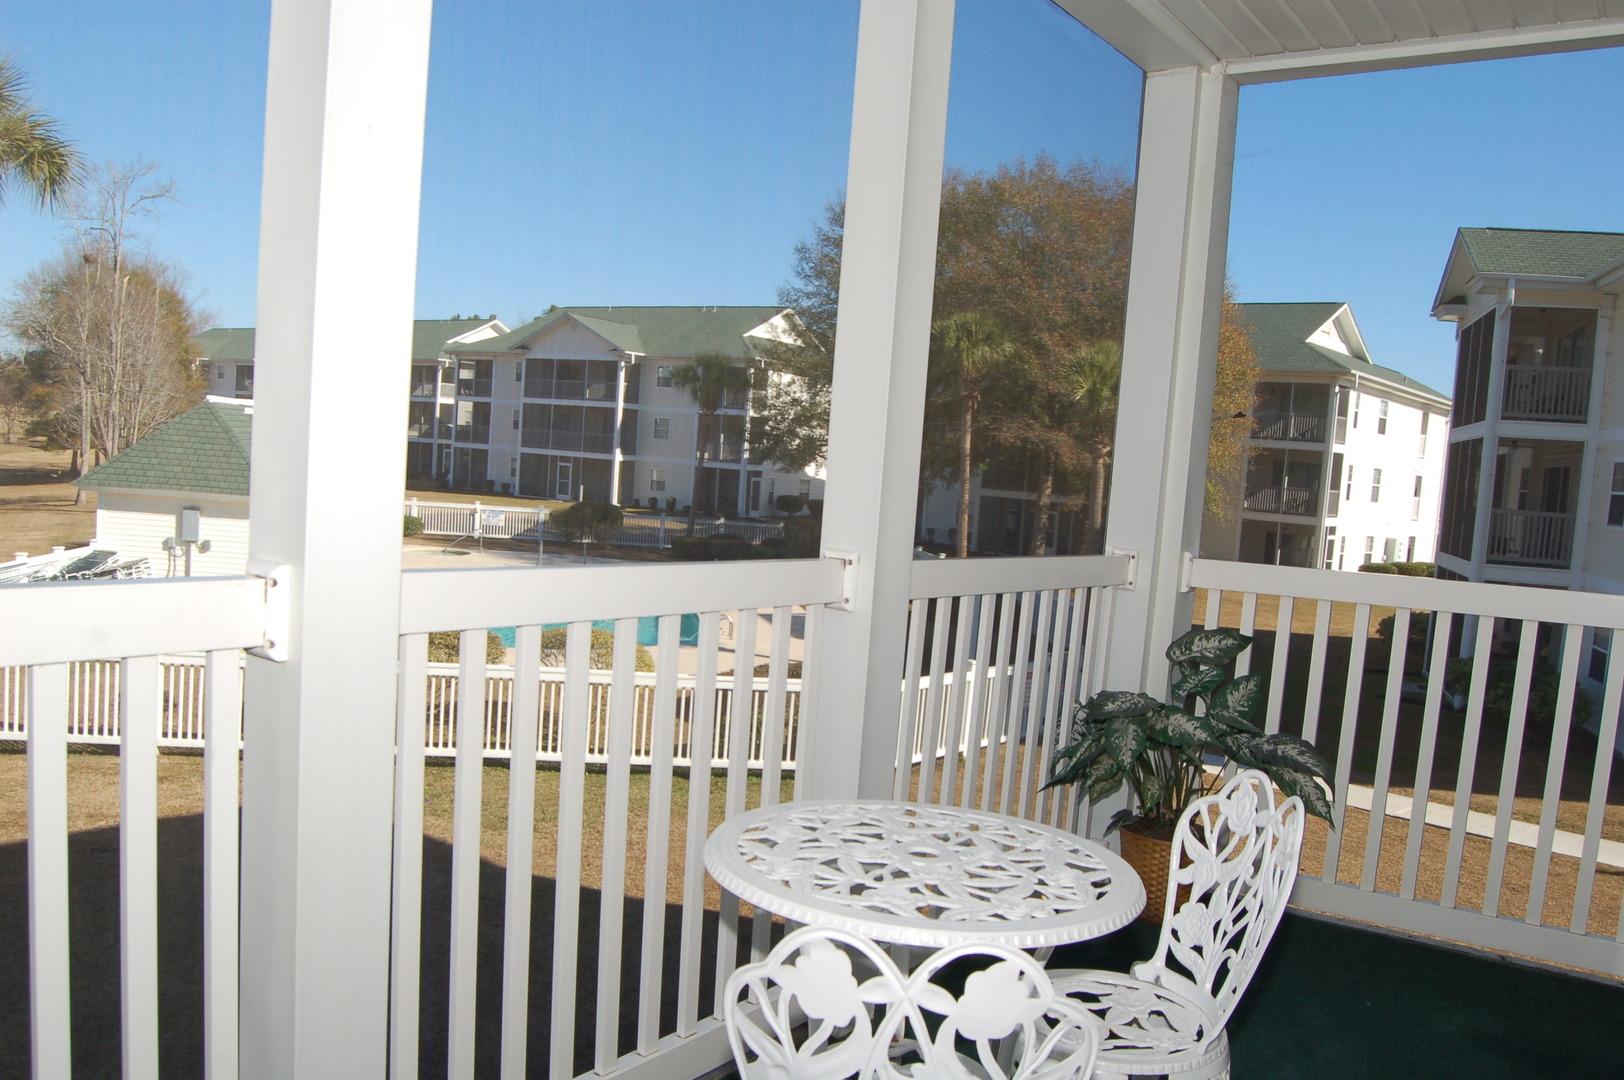 2nd Floor Furnished 1 Bedroom Condo In River Oaks Property Management